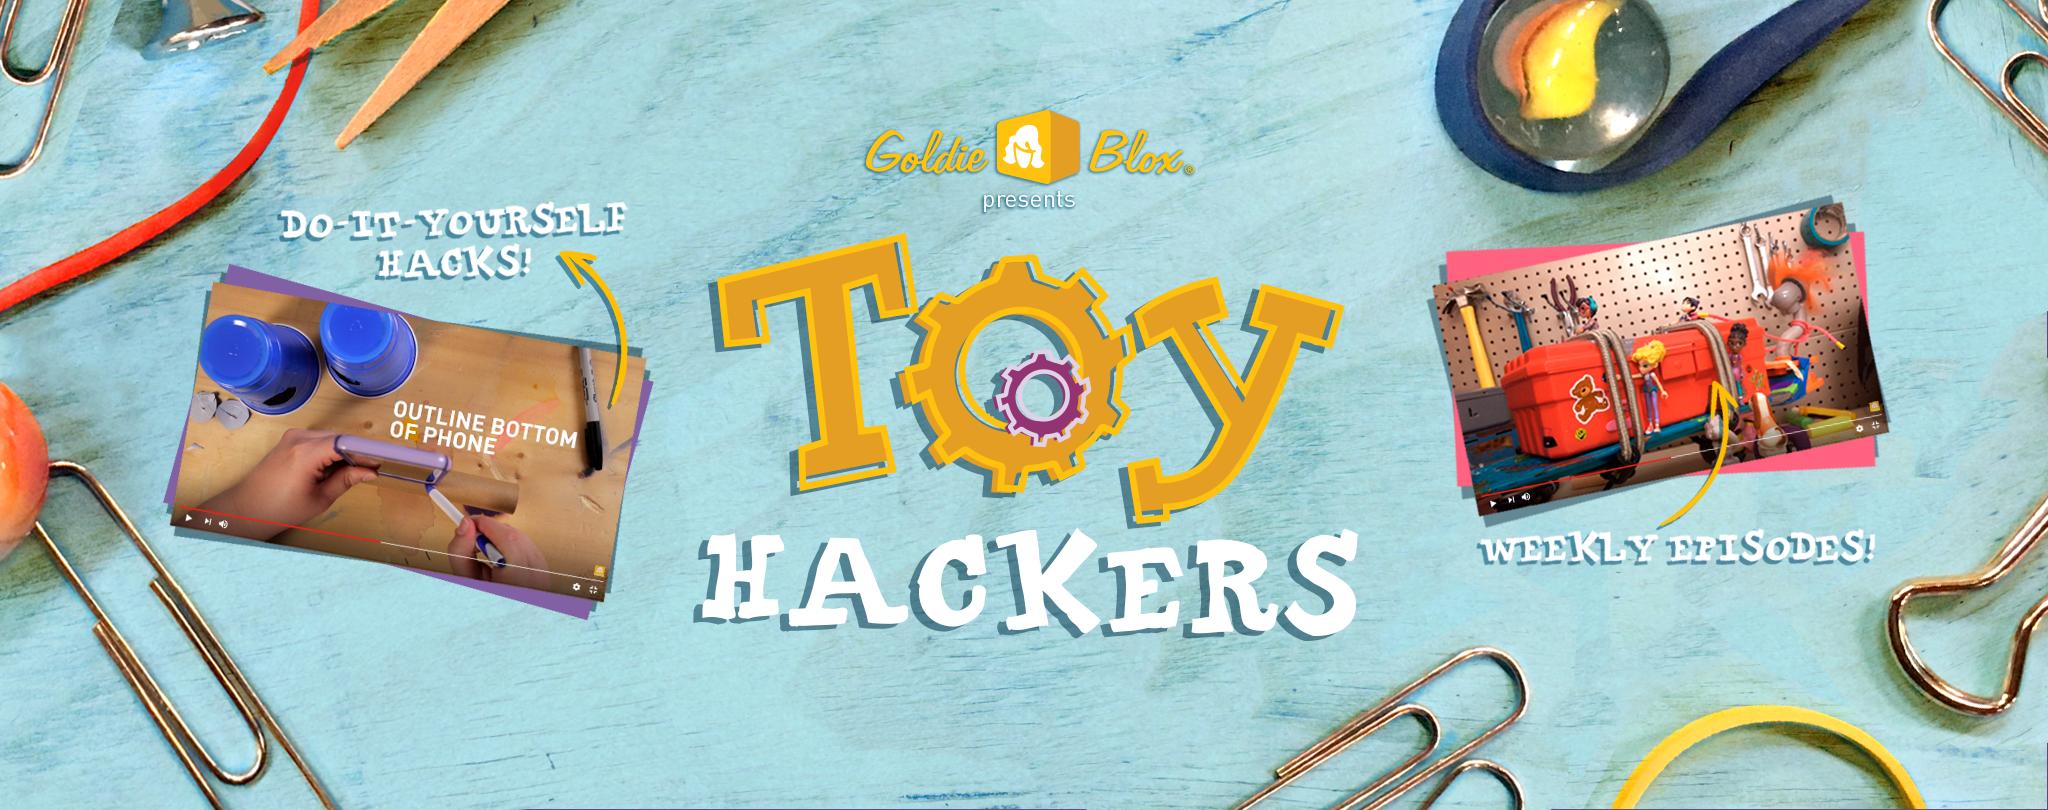 GB_ToyHackers_WebBanner_2016_09_06_RGB_144dpi.png